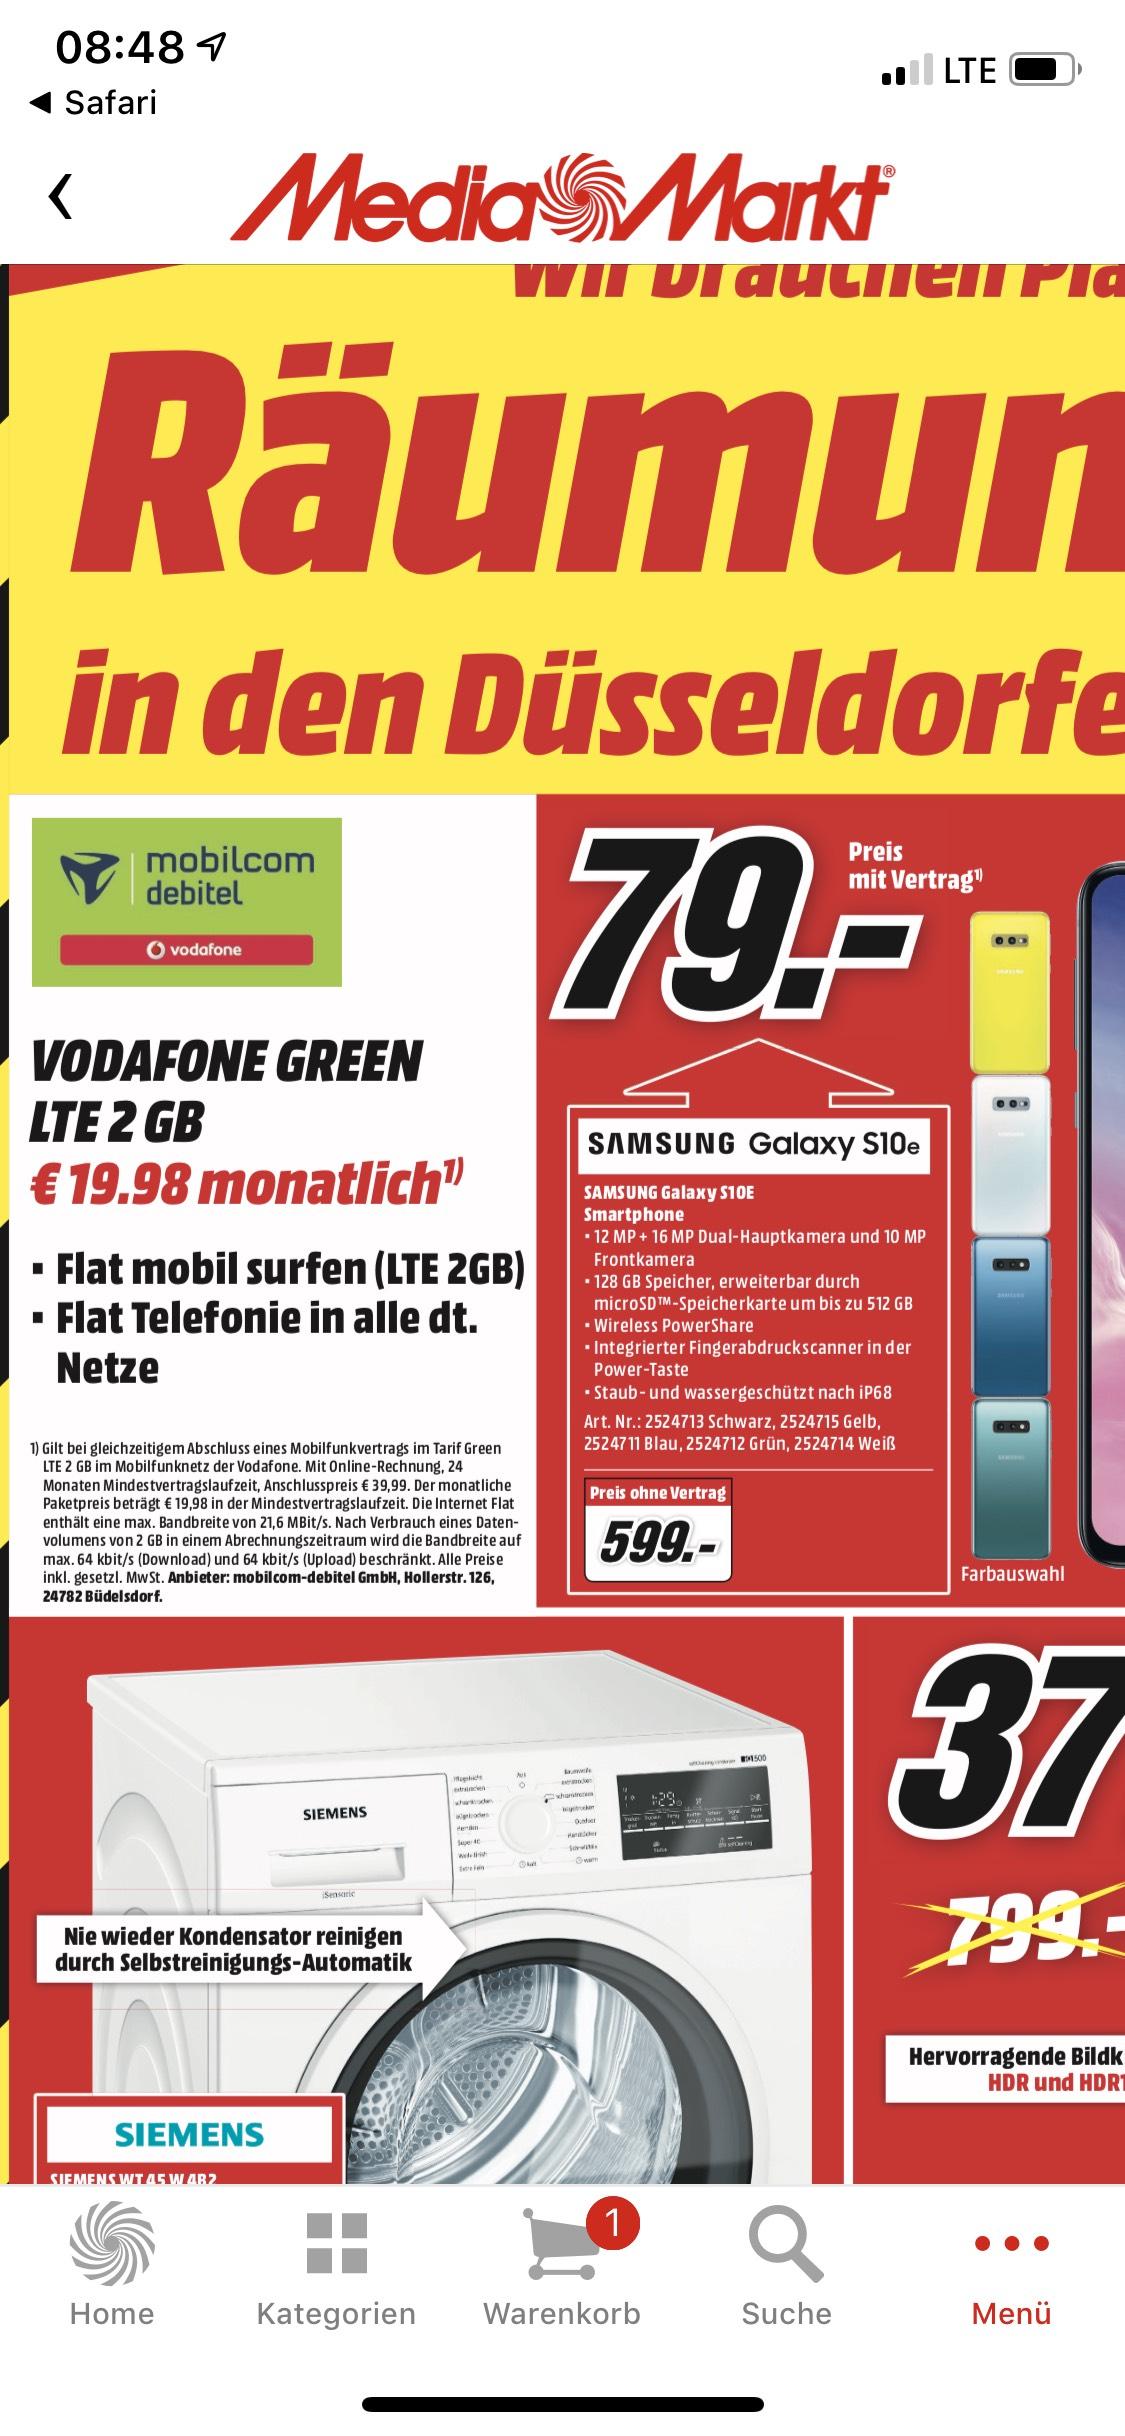 [Lokal MediaMarkt Düsseldorf-Metrostraße] Samsung S10e für 79,- & mobilcom greenLTE 2GB